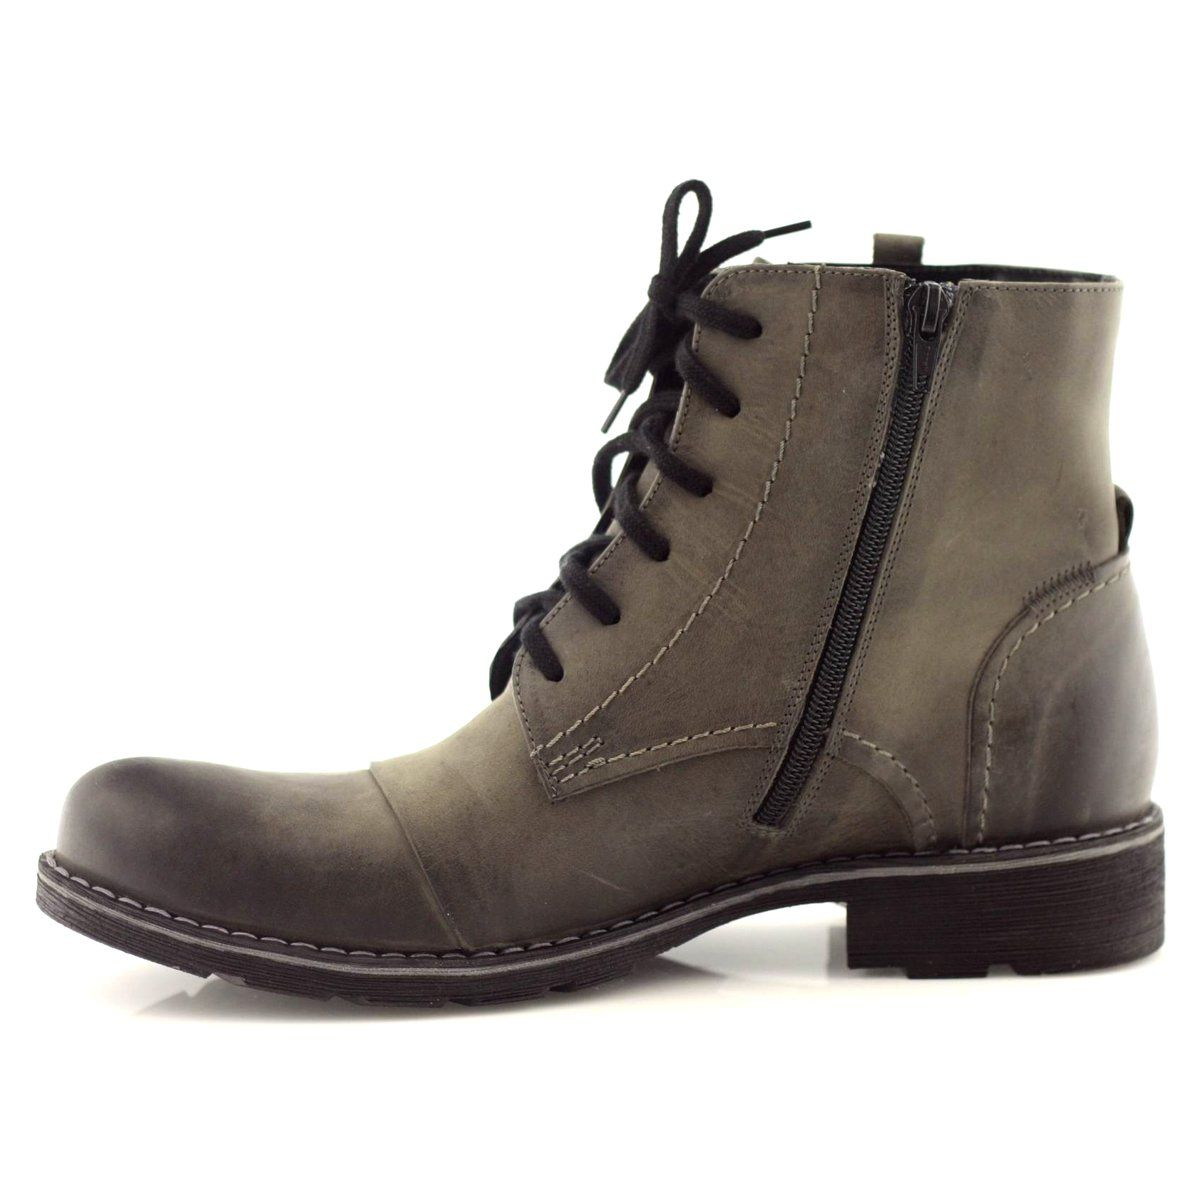 Trzewiki Traperki Zimowe Nikopol 400 Szare Combat Boots Boots Shoes